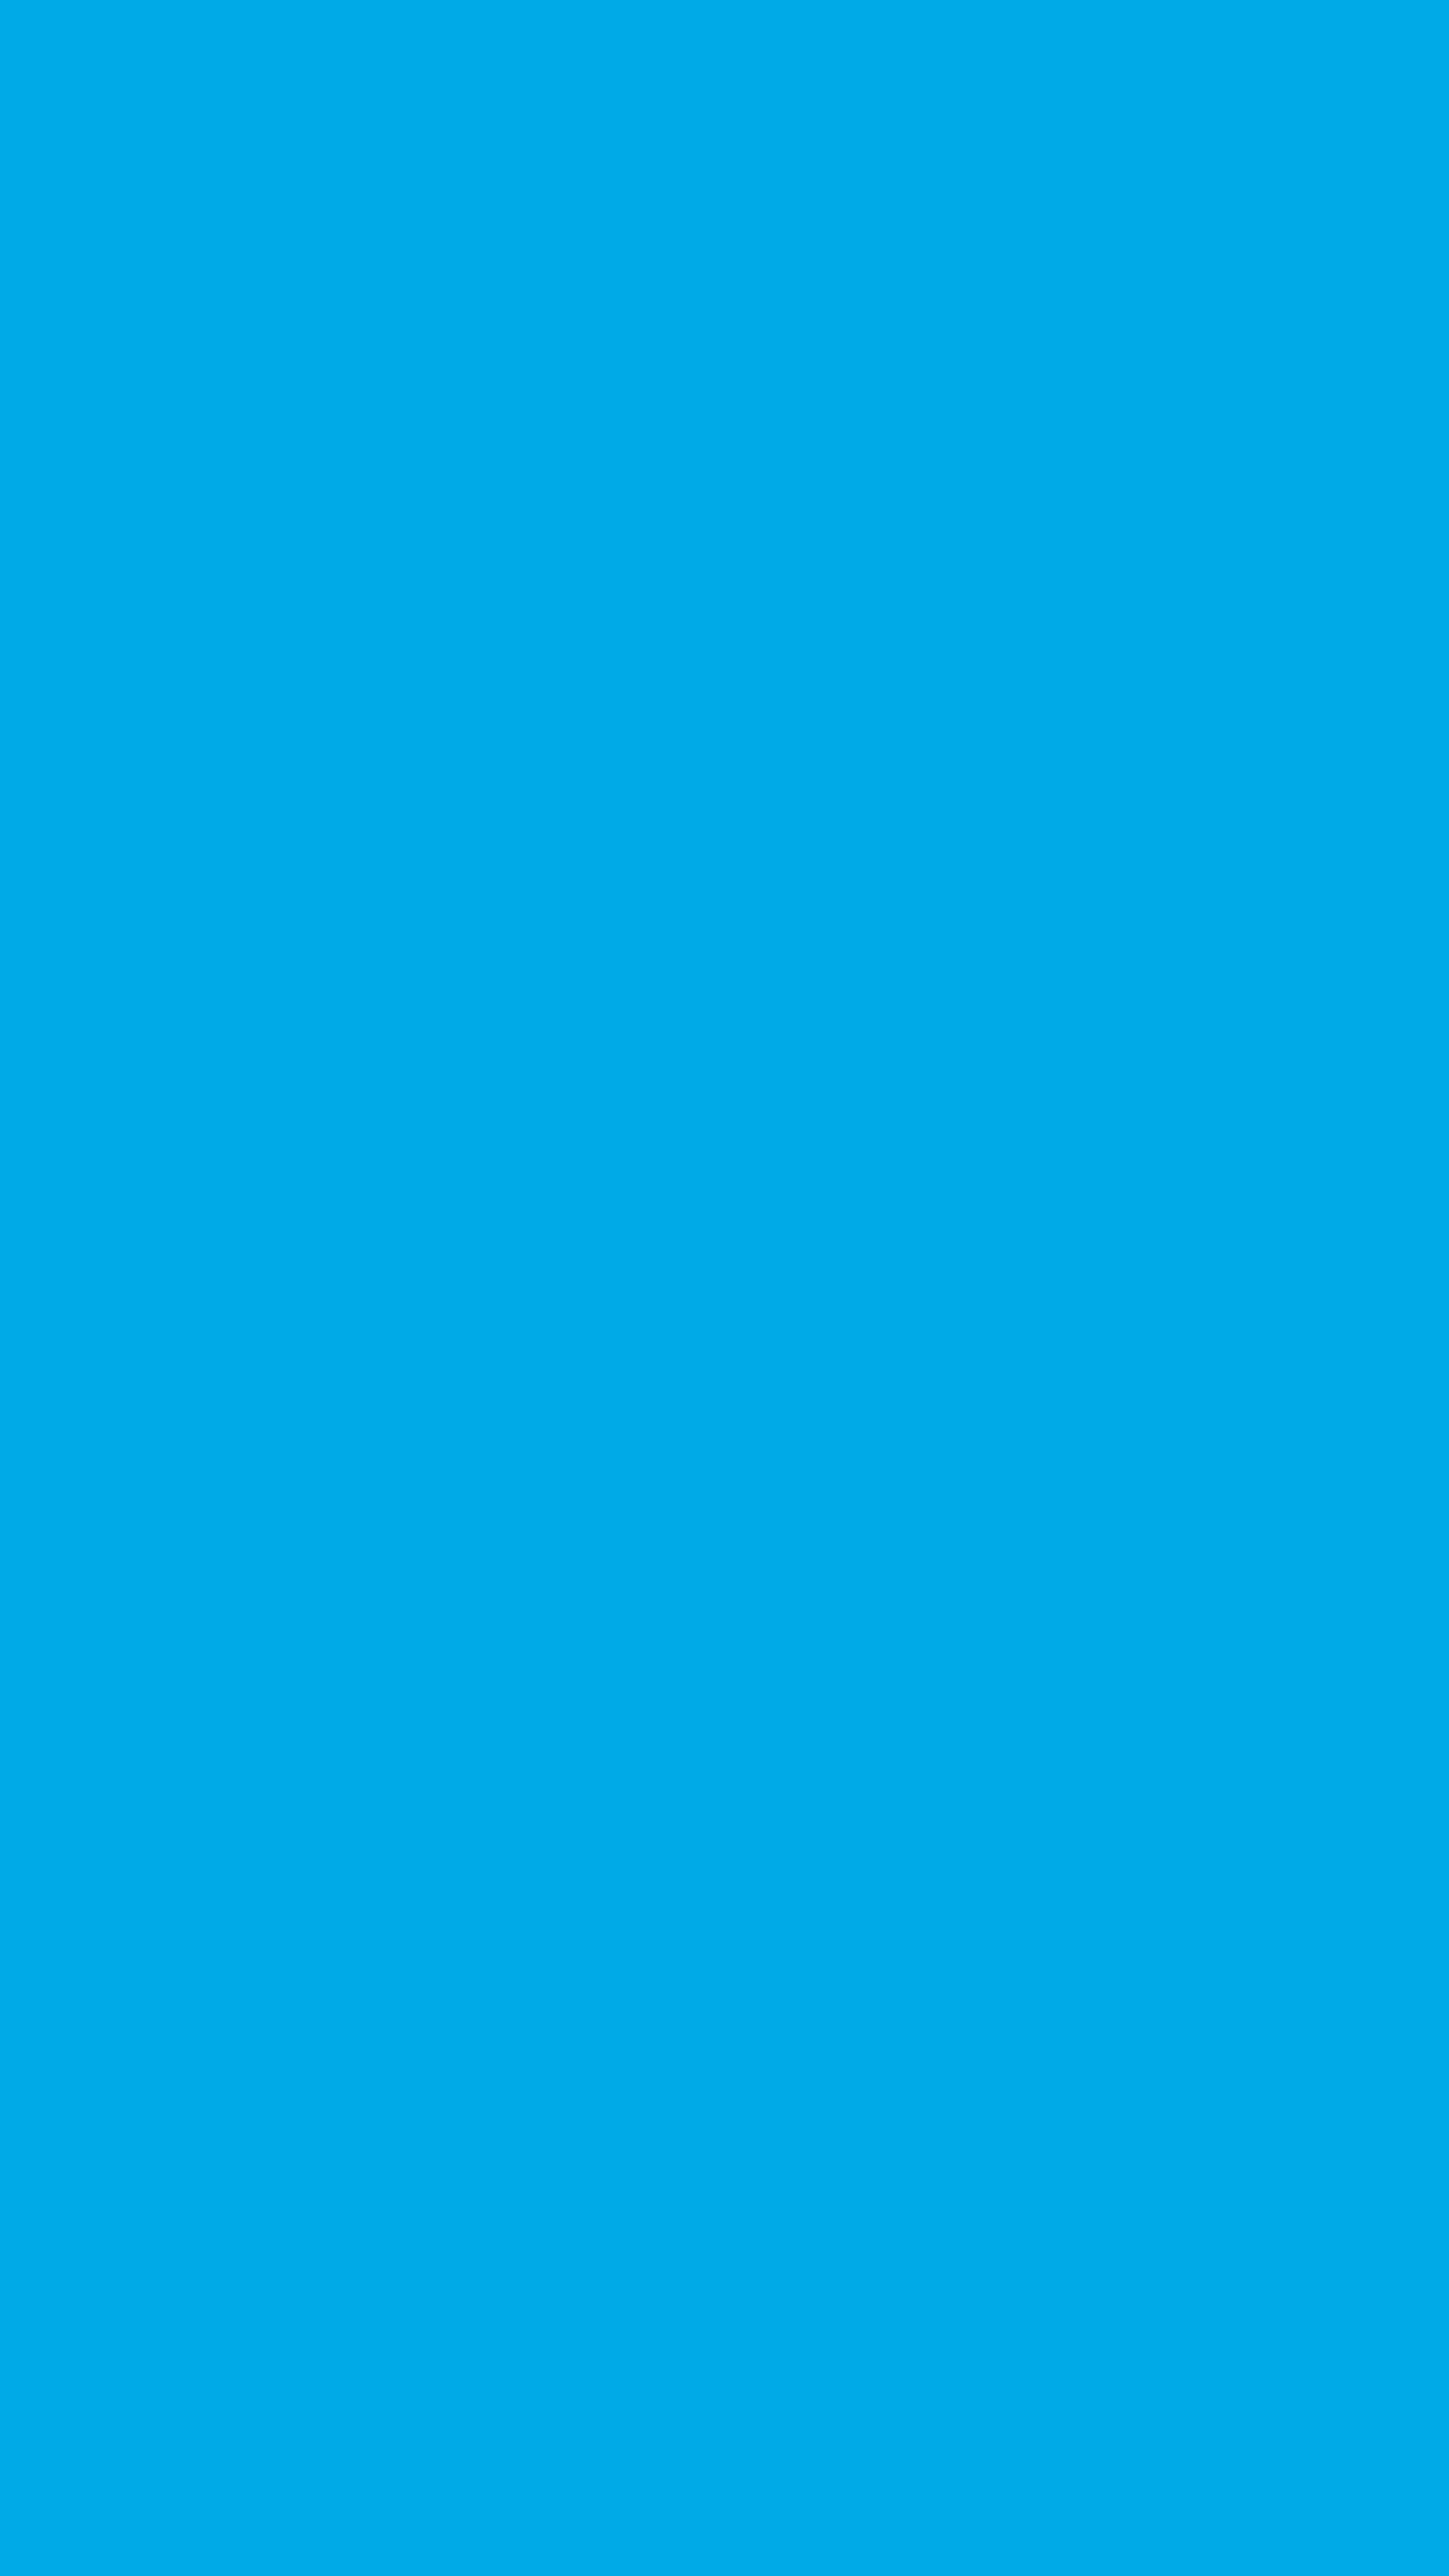 Spanish Sky Blue Solid Color Background Wallpaper For Mobile